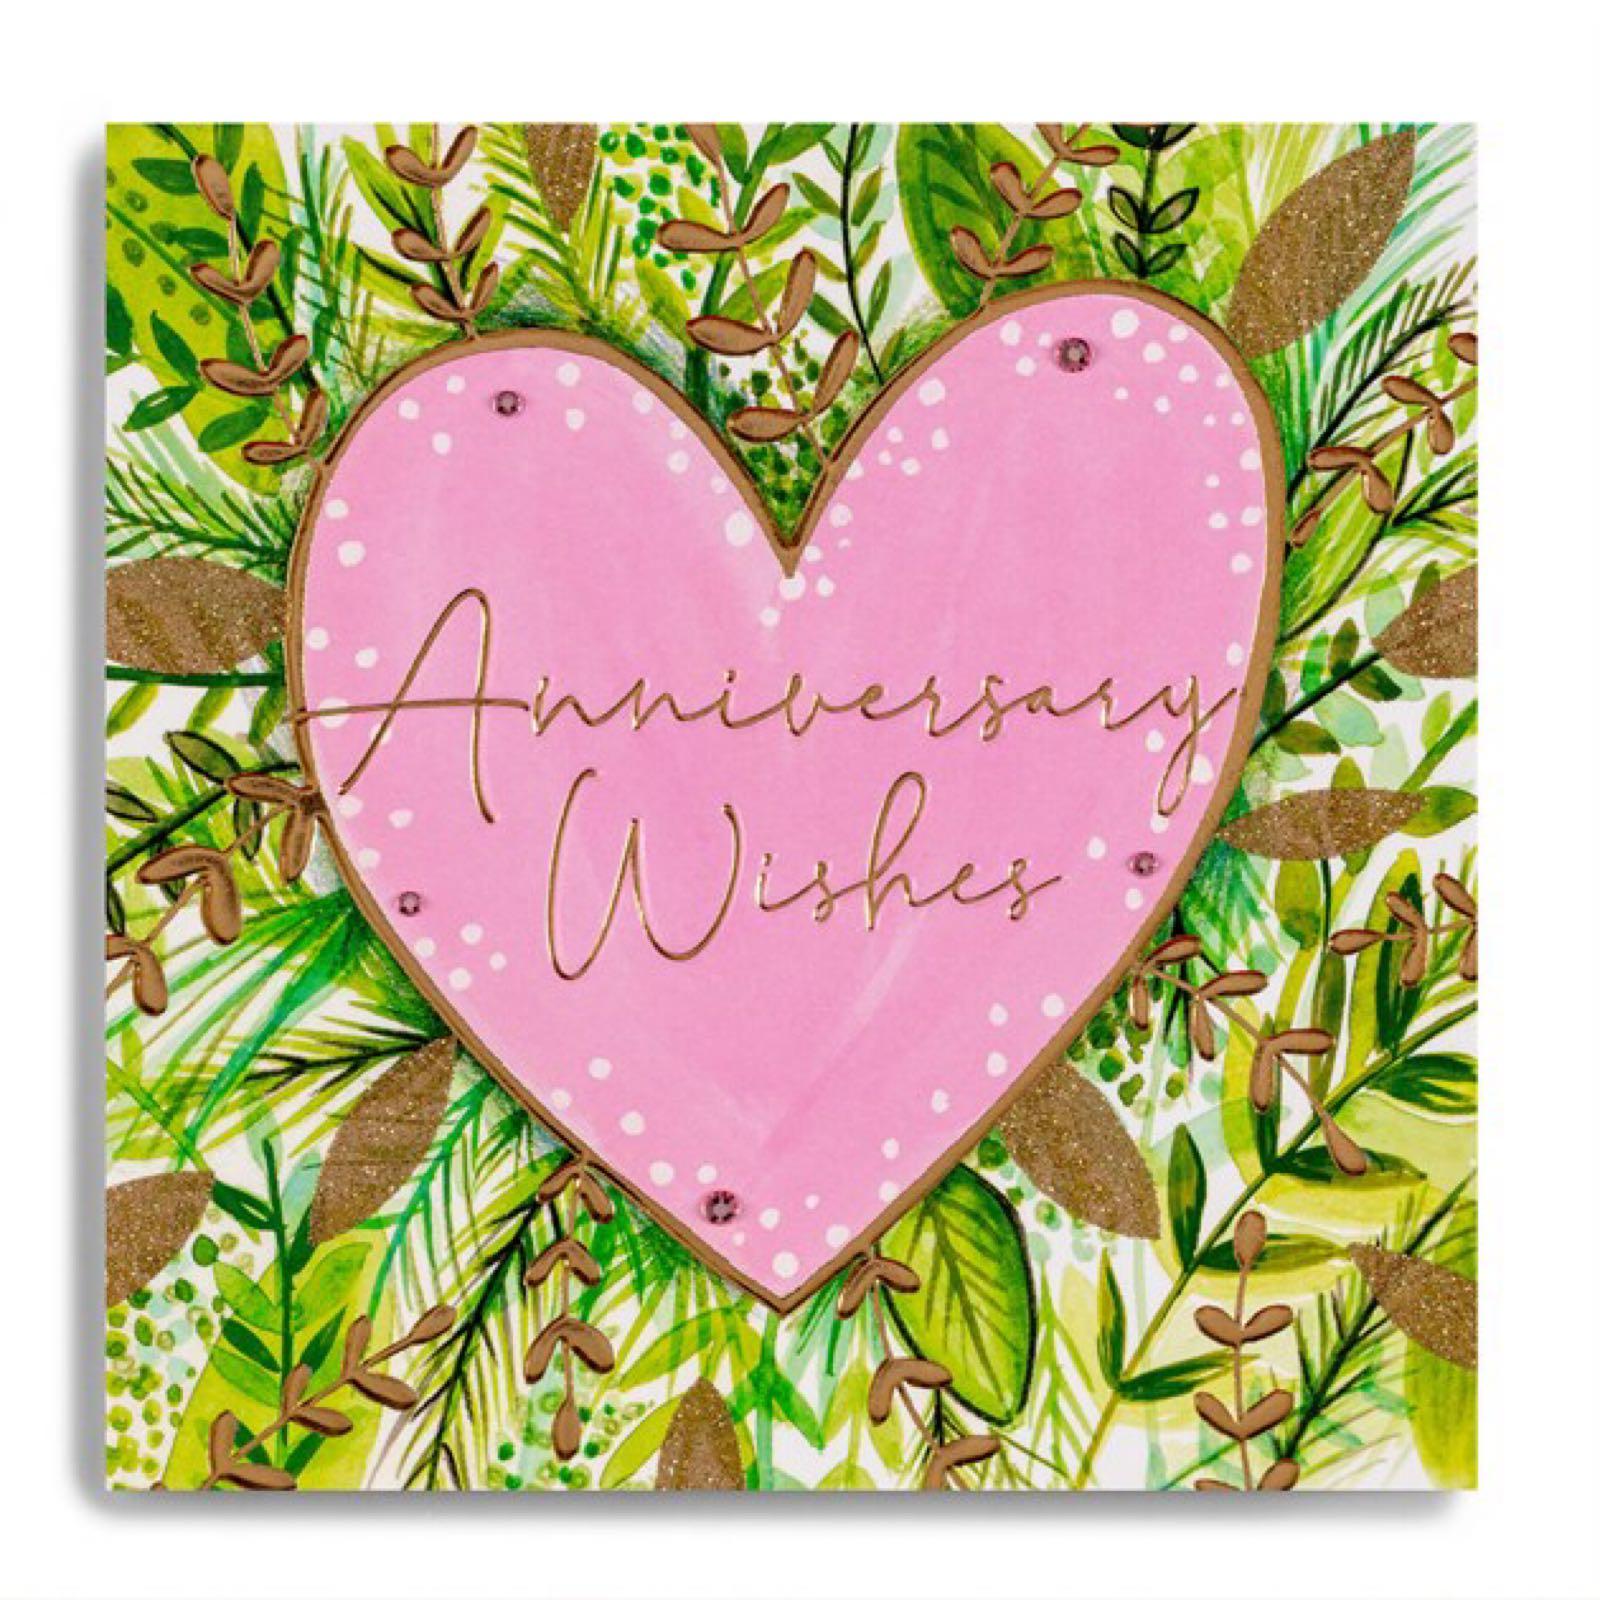 Janie Wilson anniversary wishes card